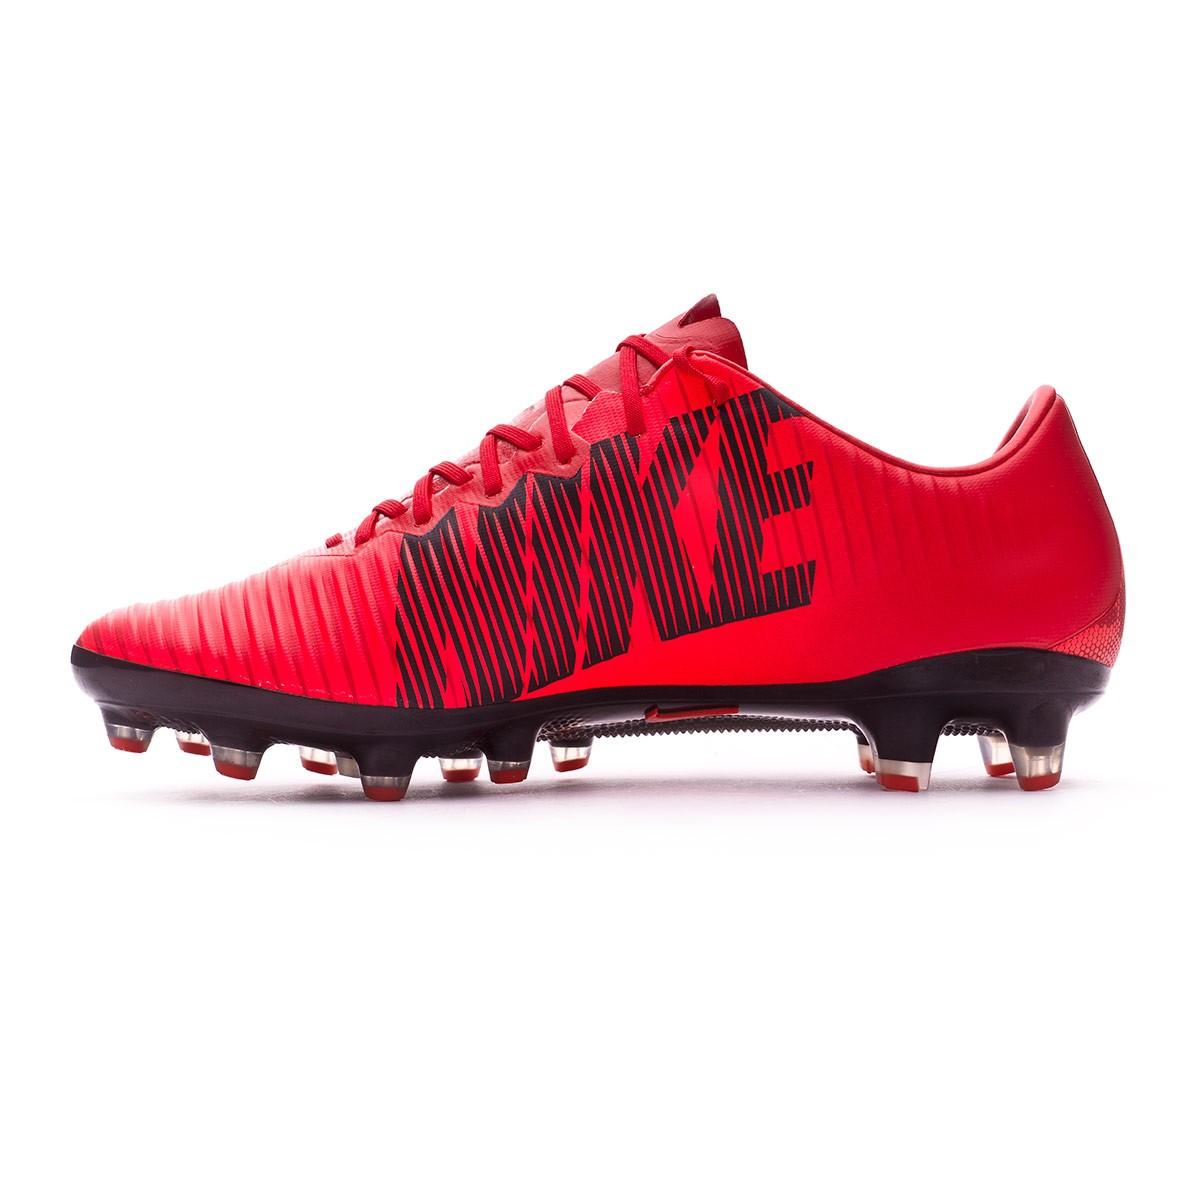 cb169bf1ce0d46 Football Boots Nike Mercurial Vapor XI ACC AG-Pro University red-Bright  crimson-Black - Tienda de fútbol Fútbol Emotion